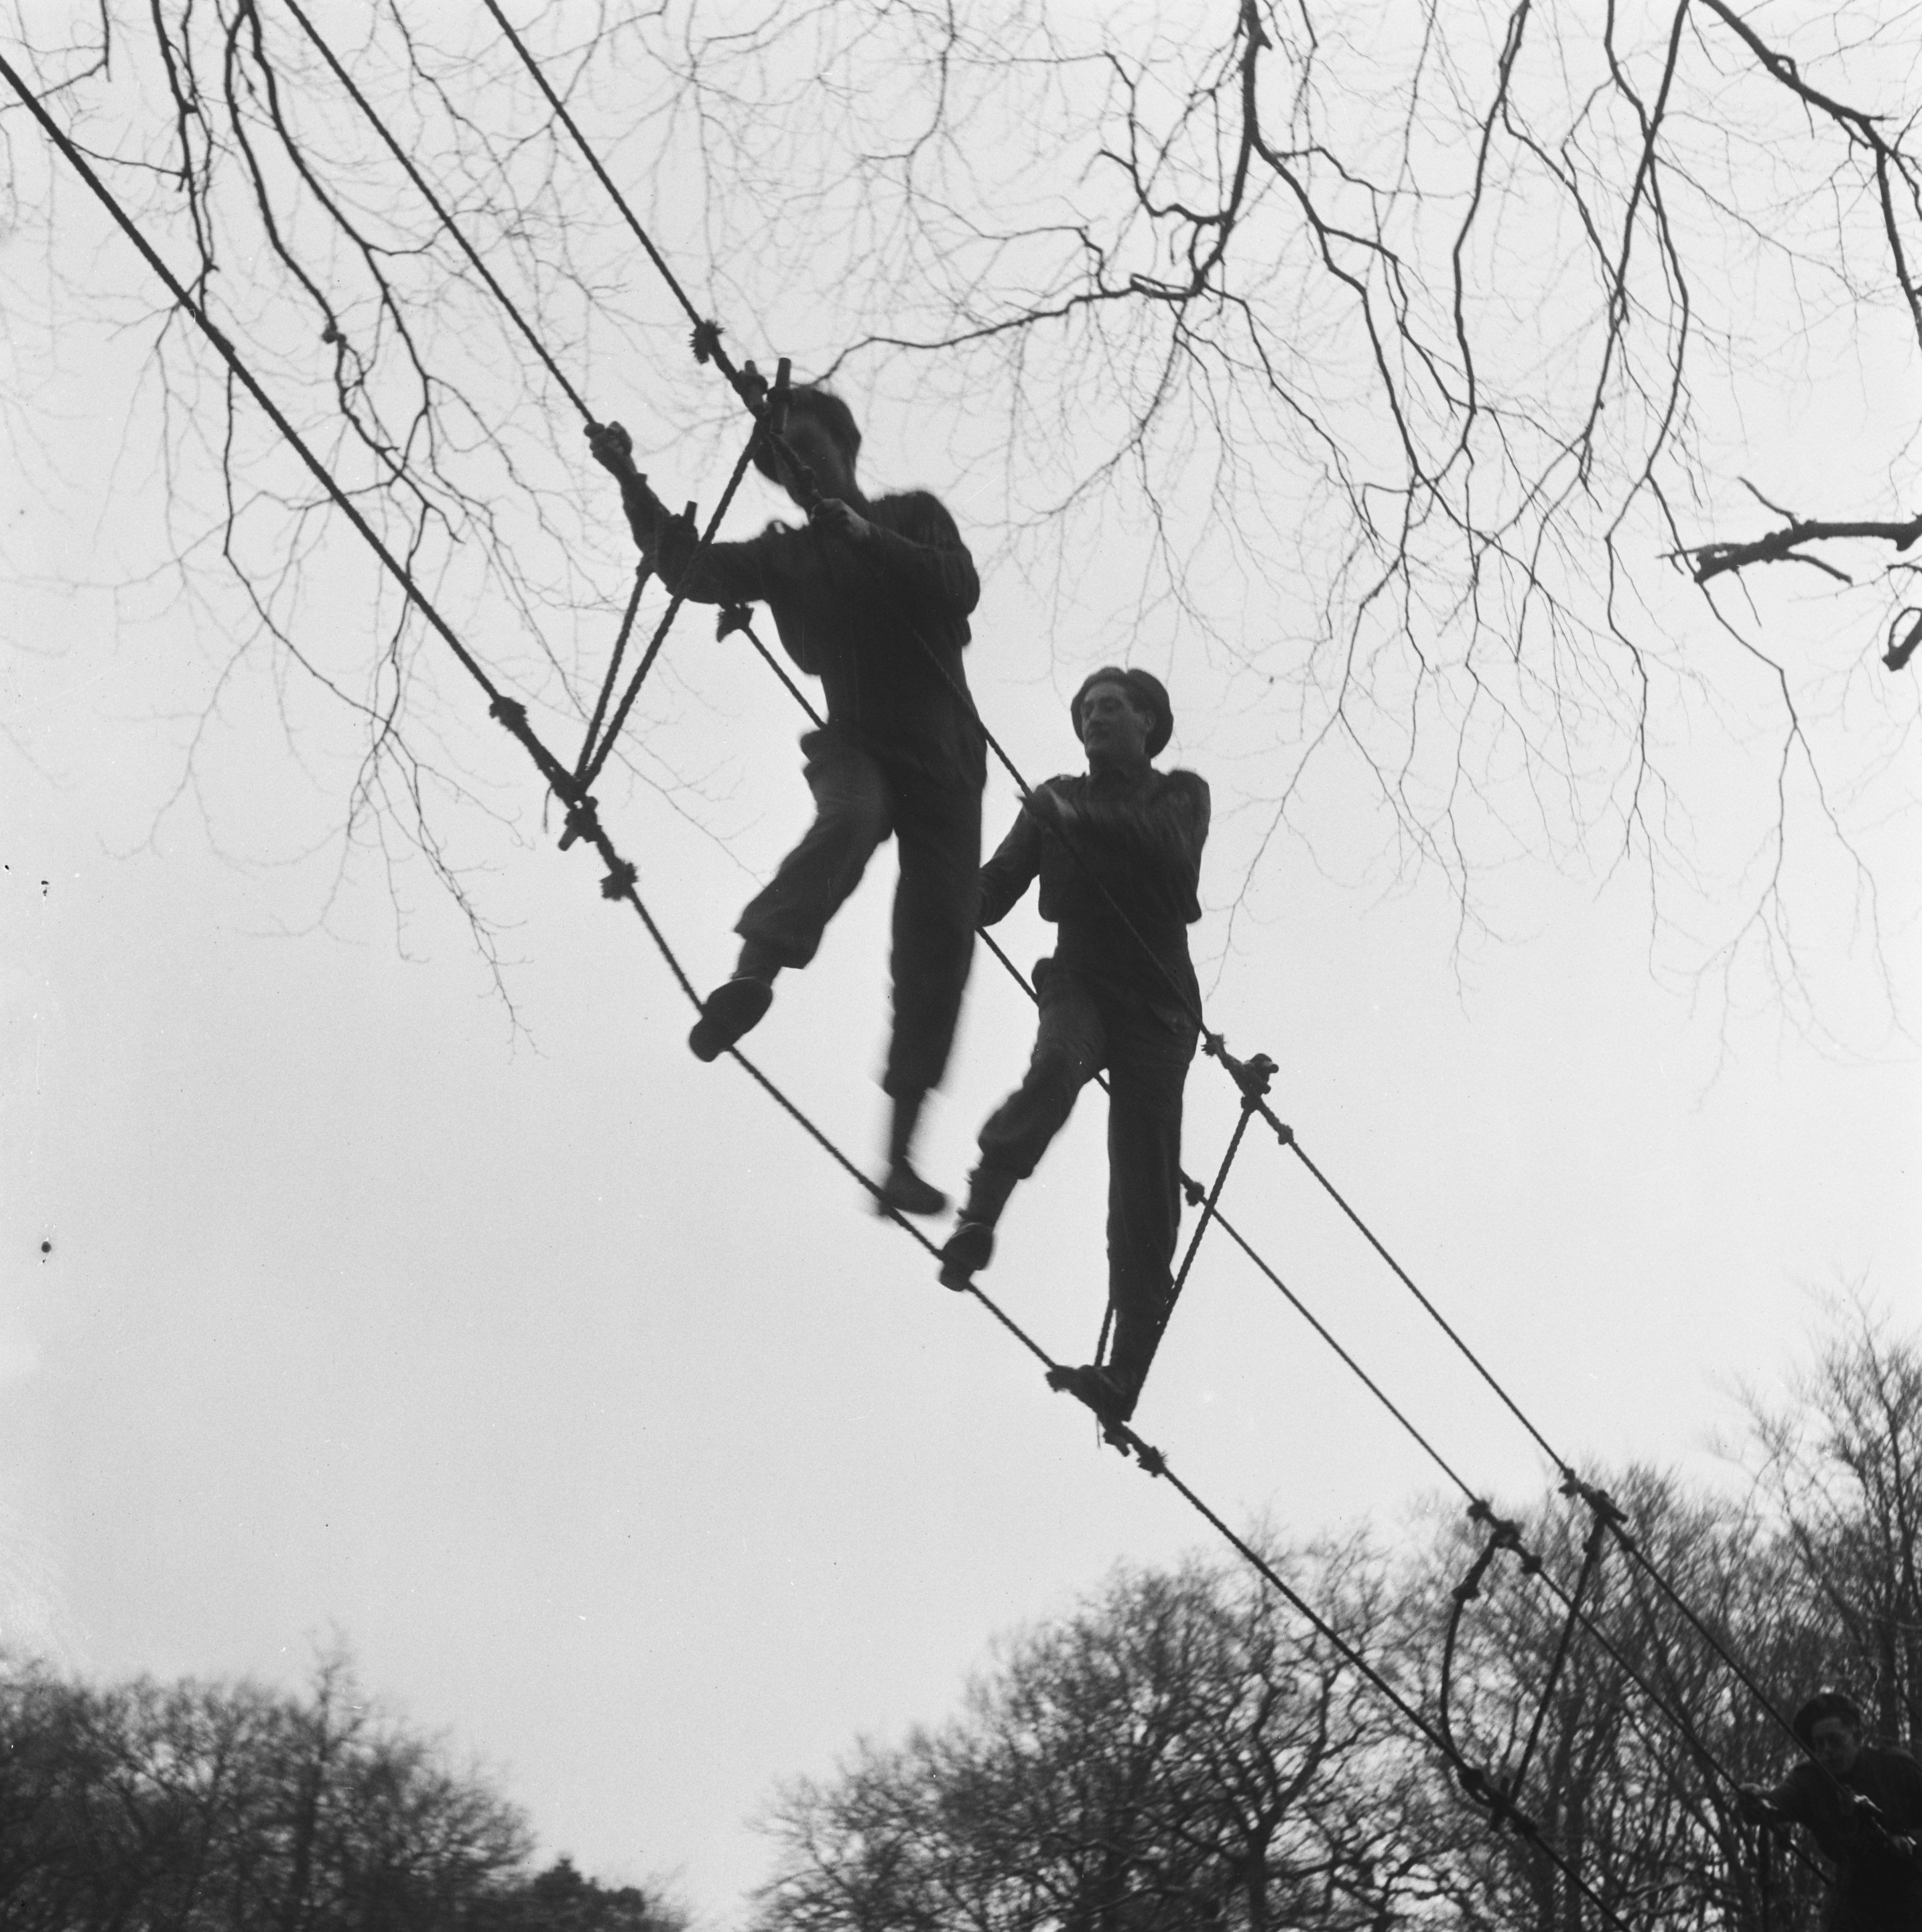 Toggle rope - Wikipedia